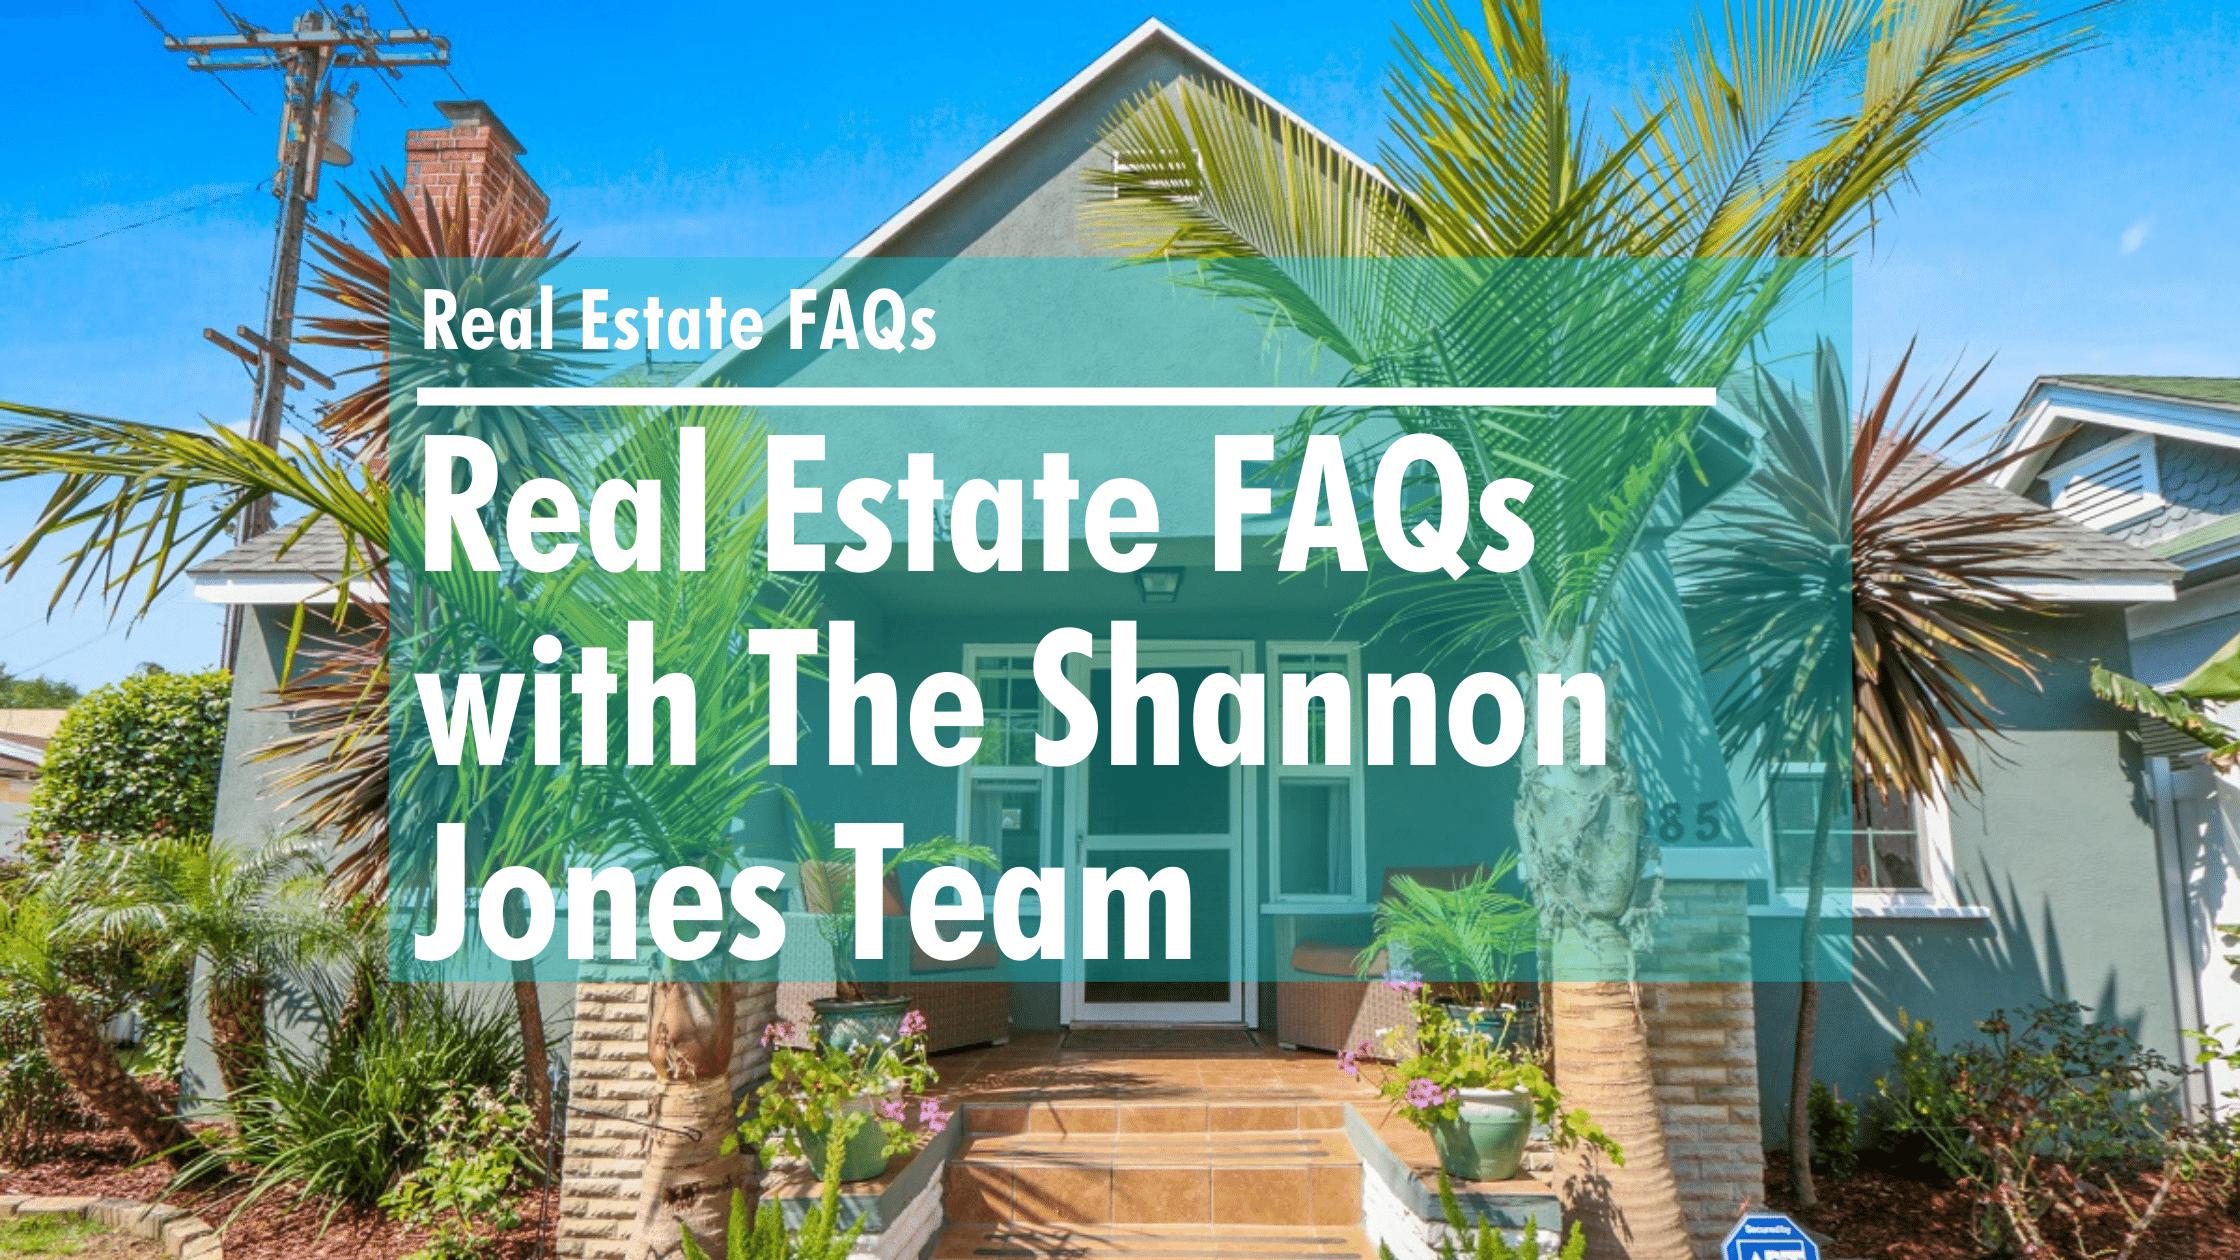 Real Estate FAQs